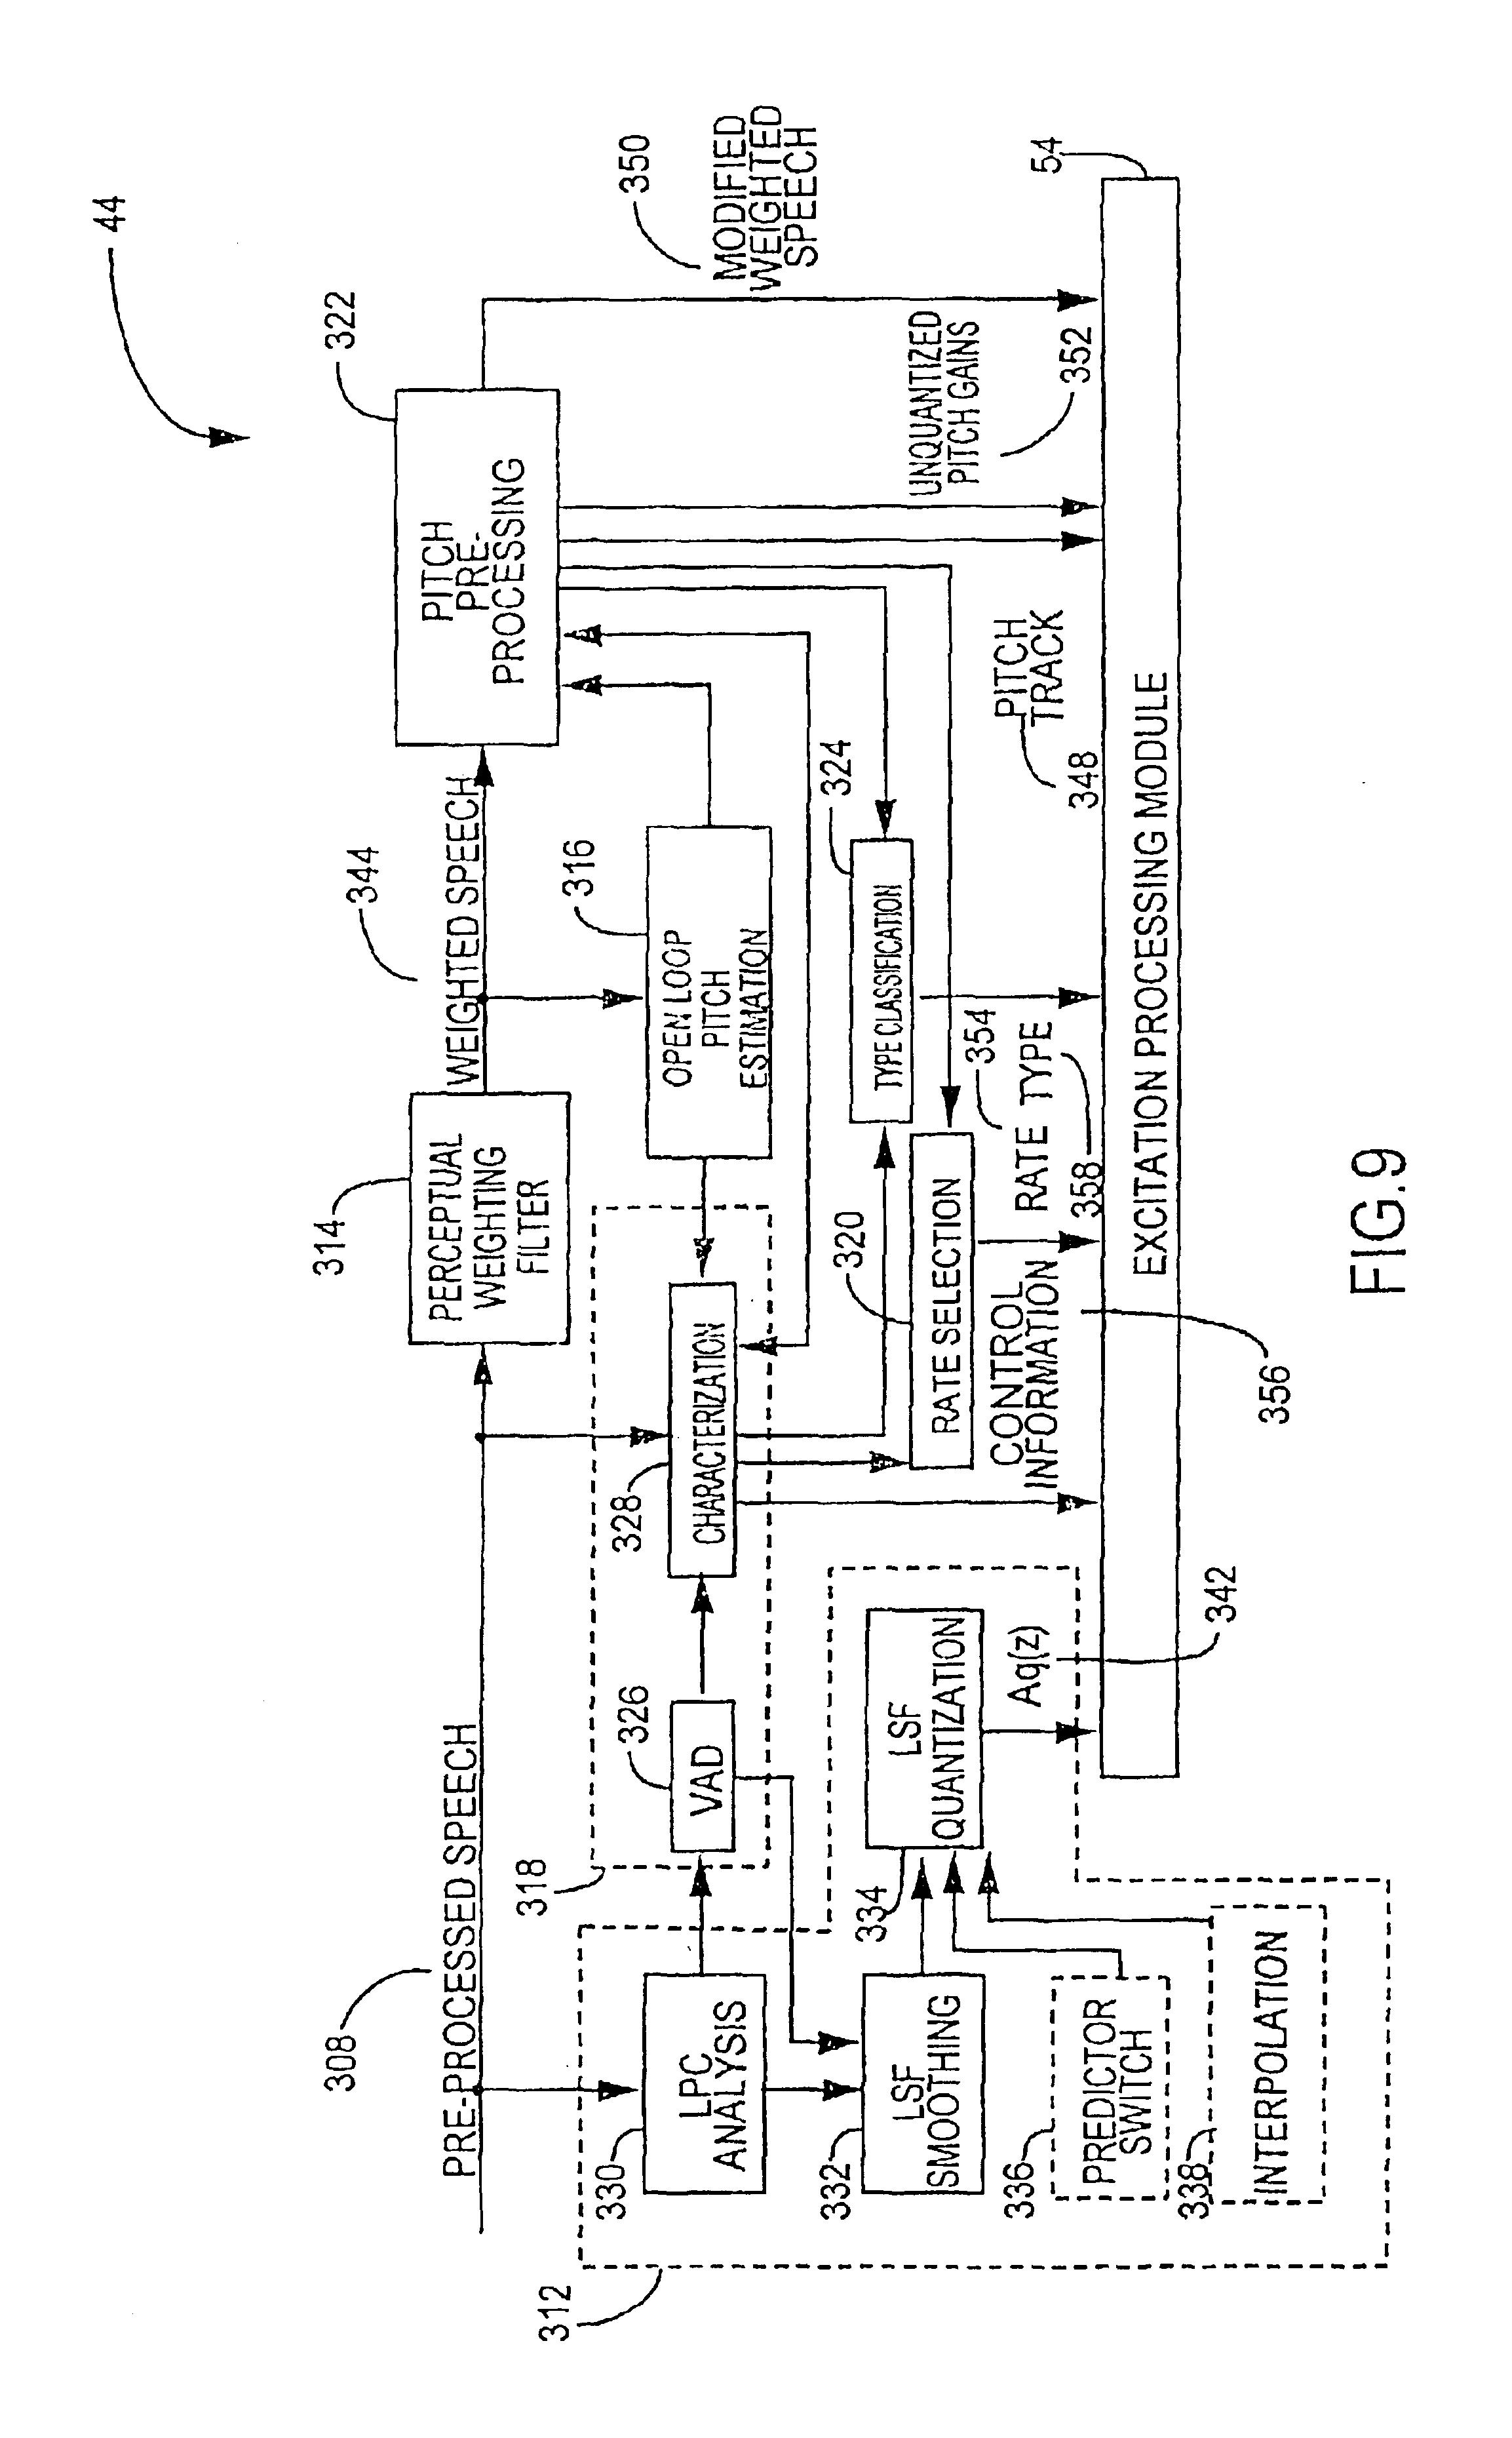 Patent Us 6 961 698 B1